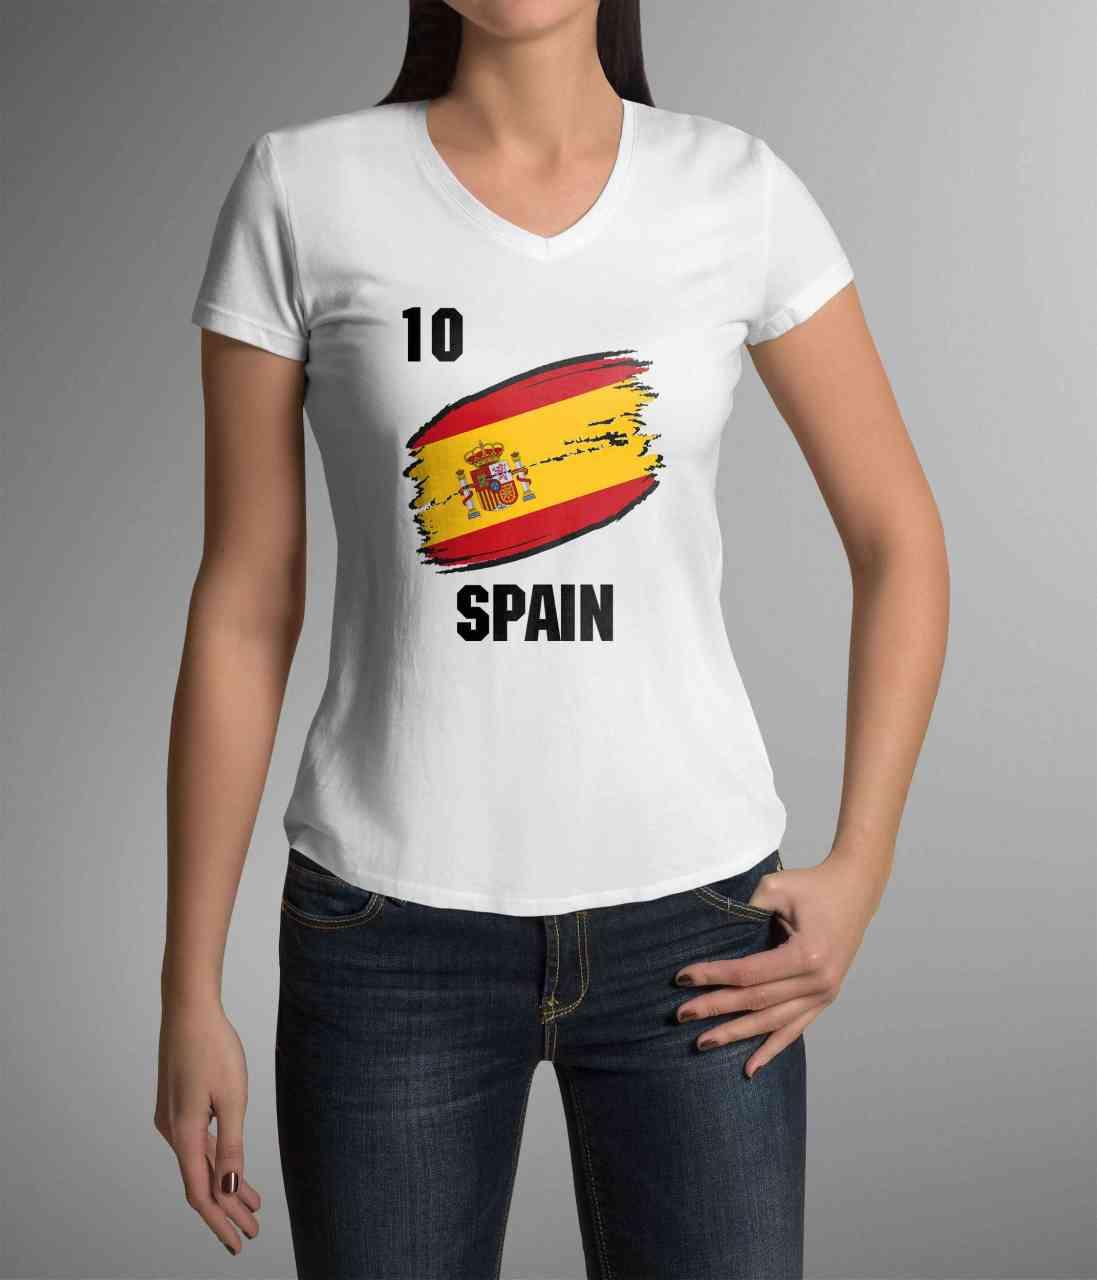 Spain | Spanien | Männer oder Frauen Trikot T - Shirt mit Wunsch Nummer + Wunsch Name | WM 2018